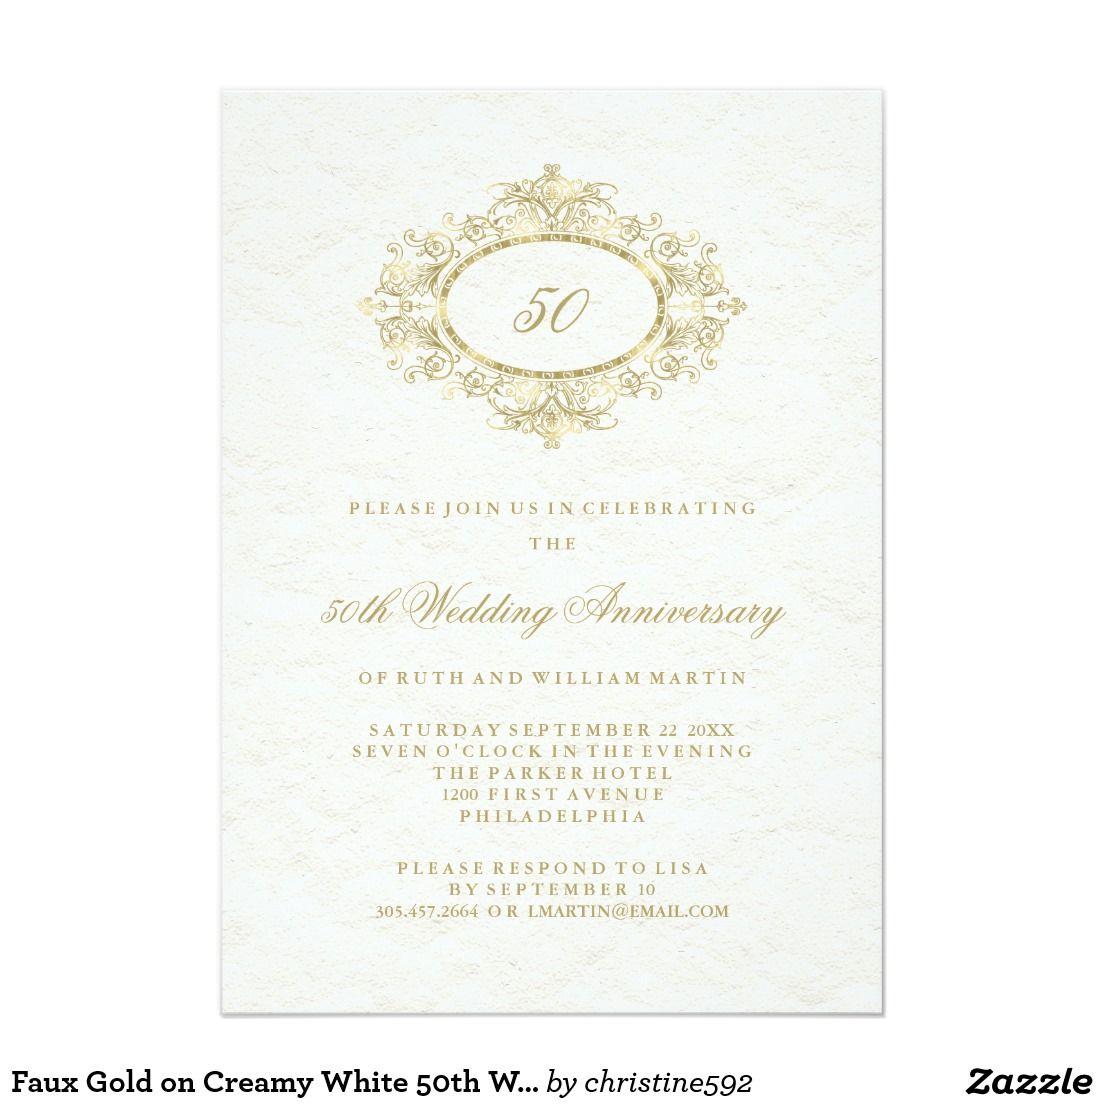 Faux Gold on Creamy White 50th Wedding Anniversary Invitation Card ...